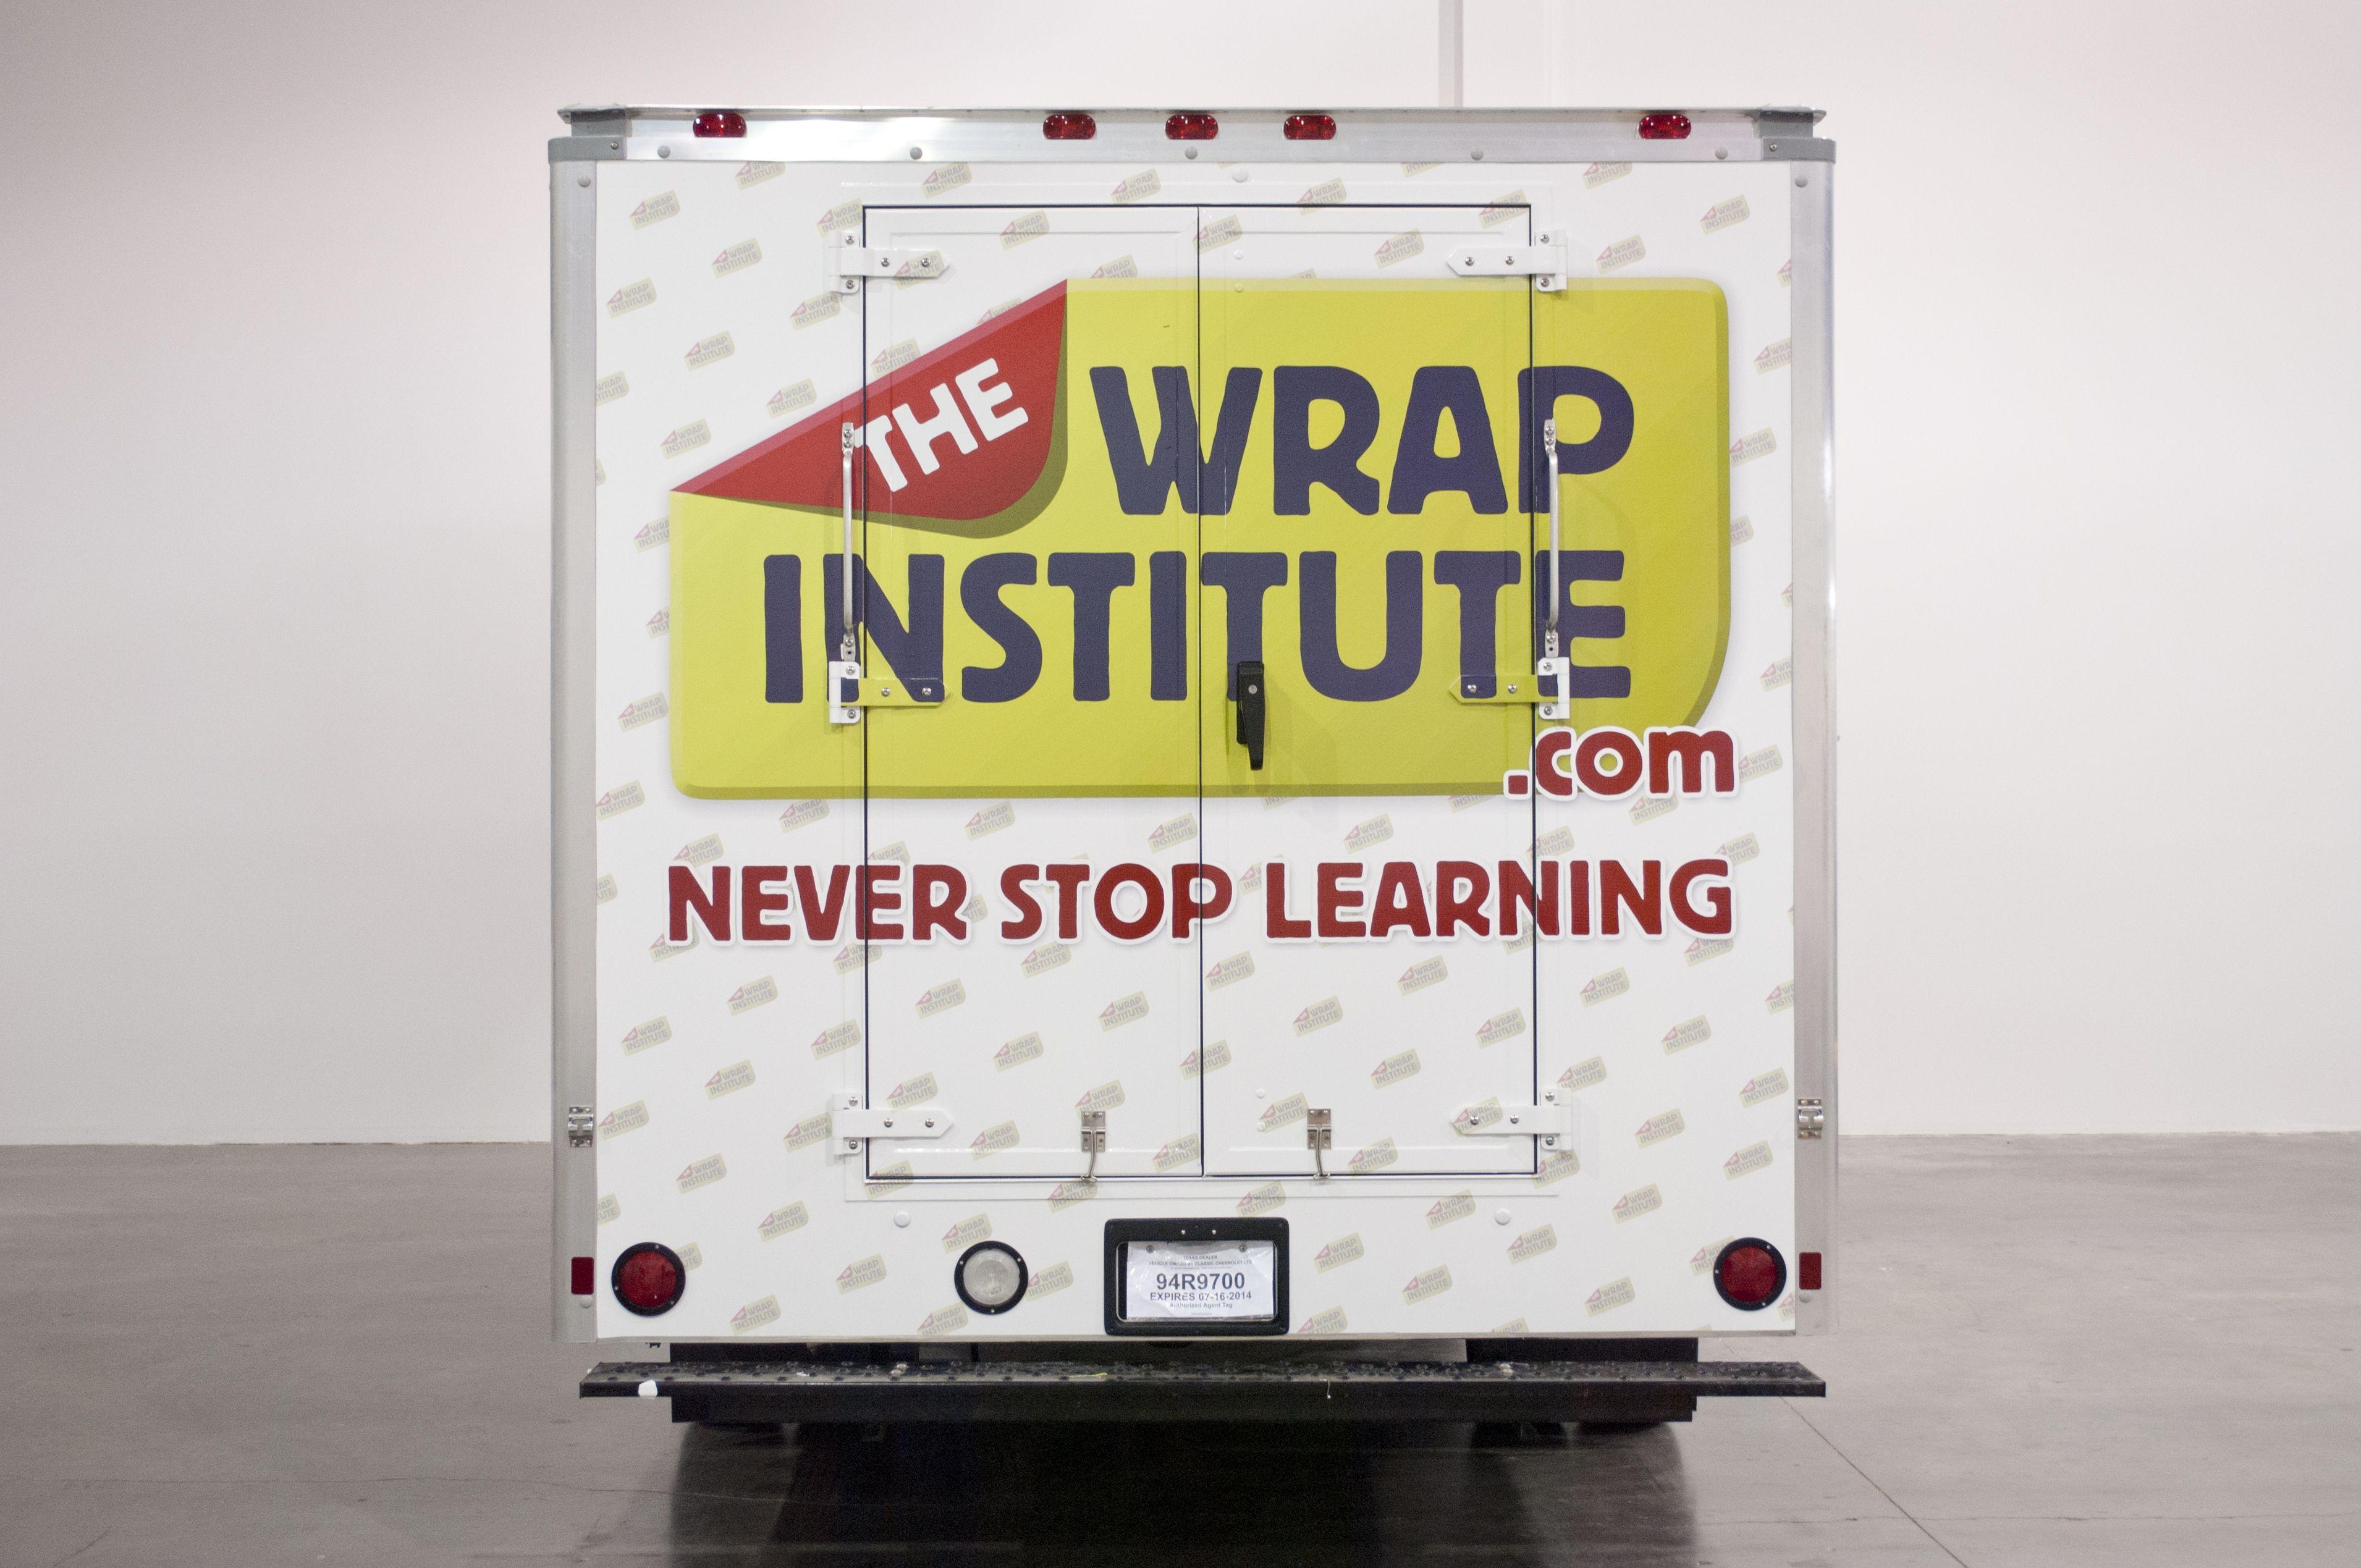 The Wrap Institute Car Wrap City www